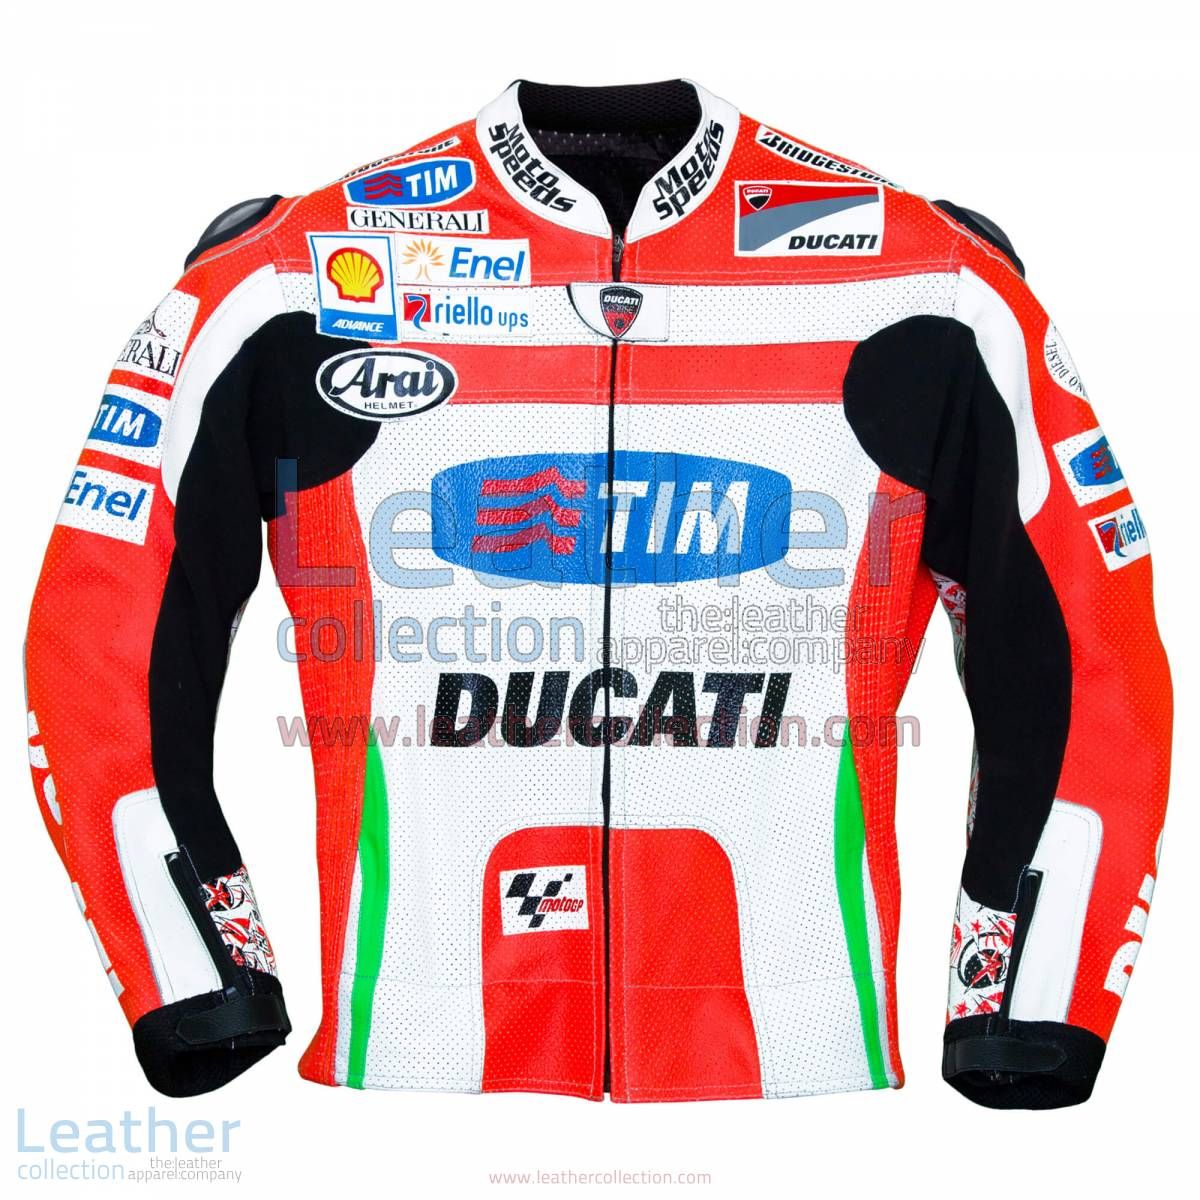 Nicky Hayden Ducati 2012 MotoGP Leather Jacket | Nicky Hayden,Nicky Hayden Ducati 2012 MotoGP Leather Jacket